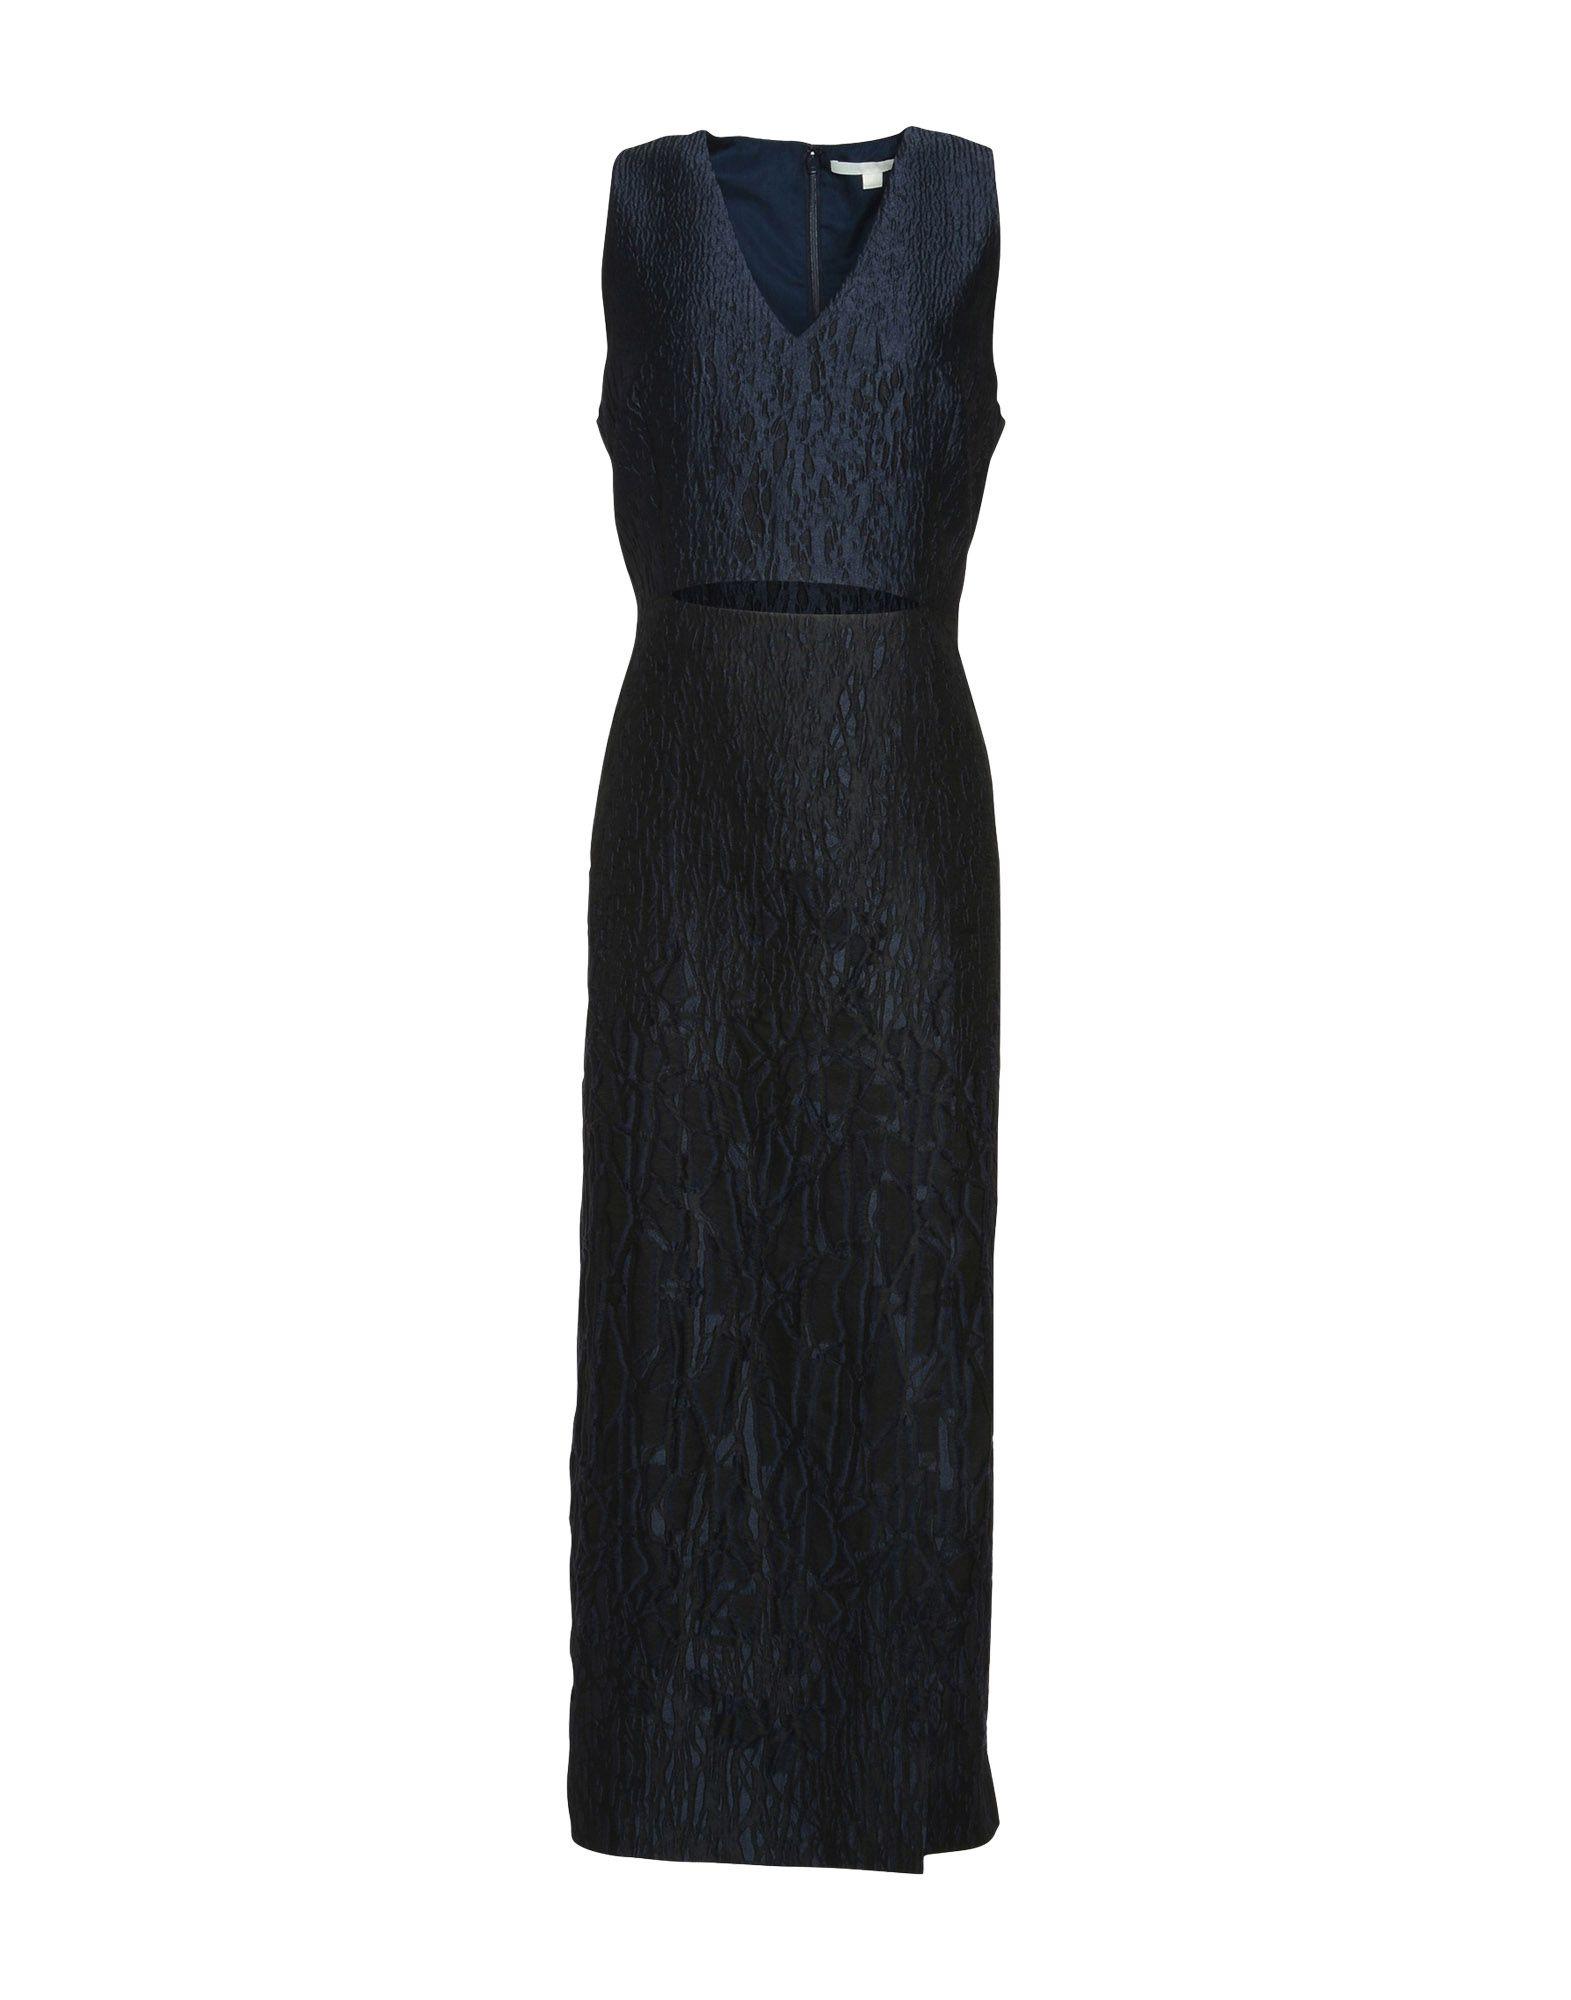 JONATHAN SIMKHAI Платье длиной 3/4 lisa corti платье длиной 3 4